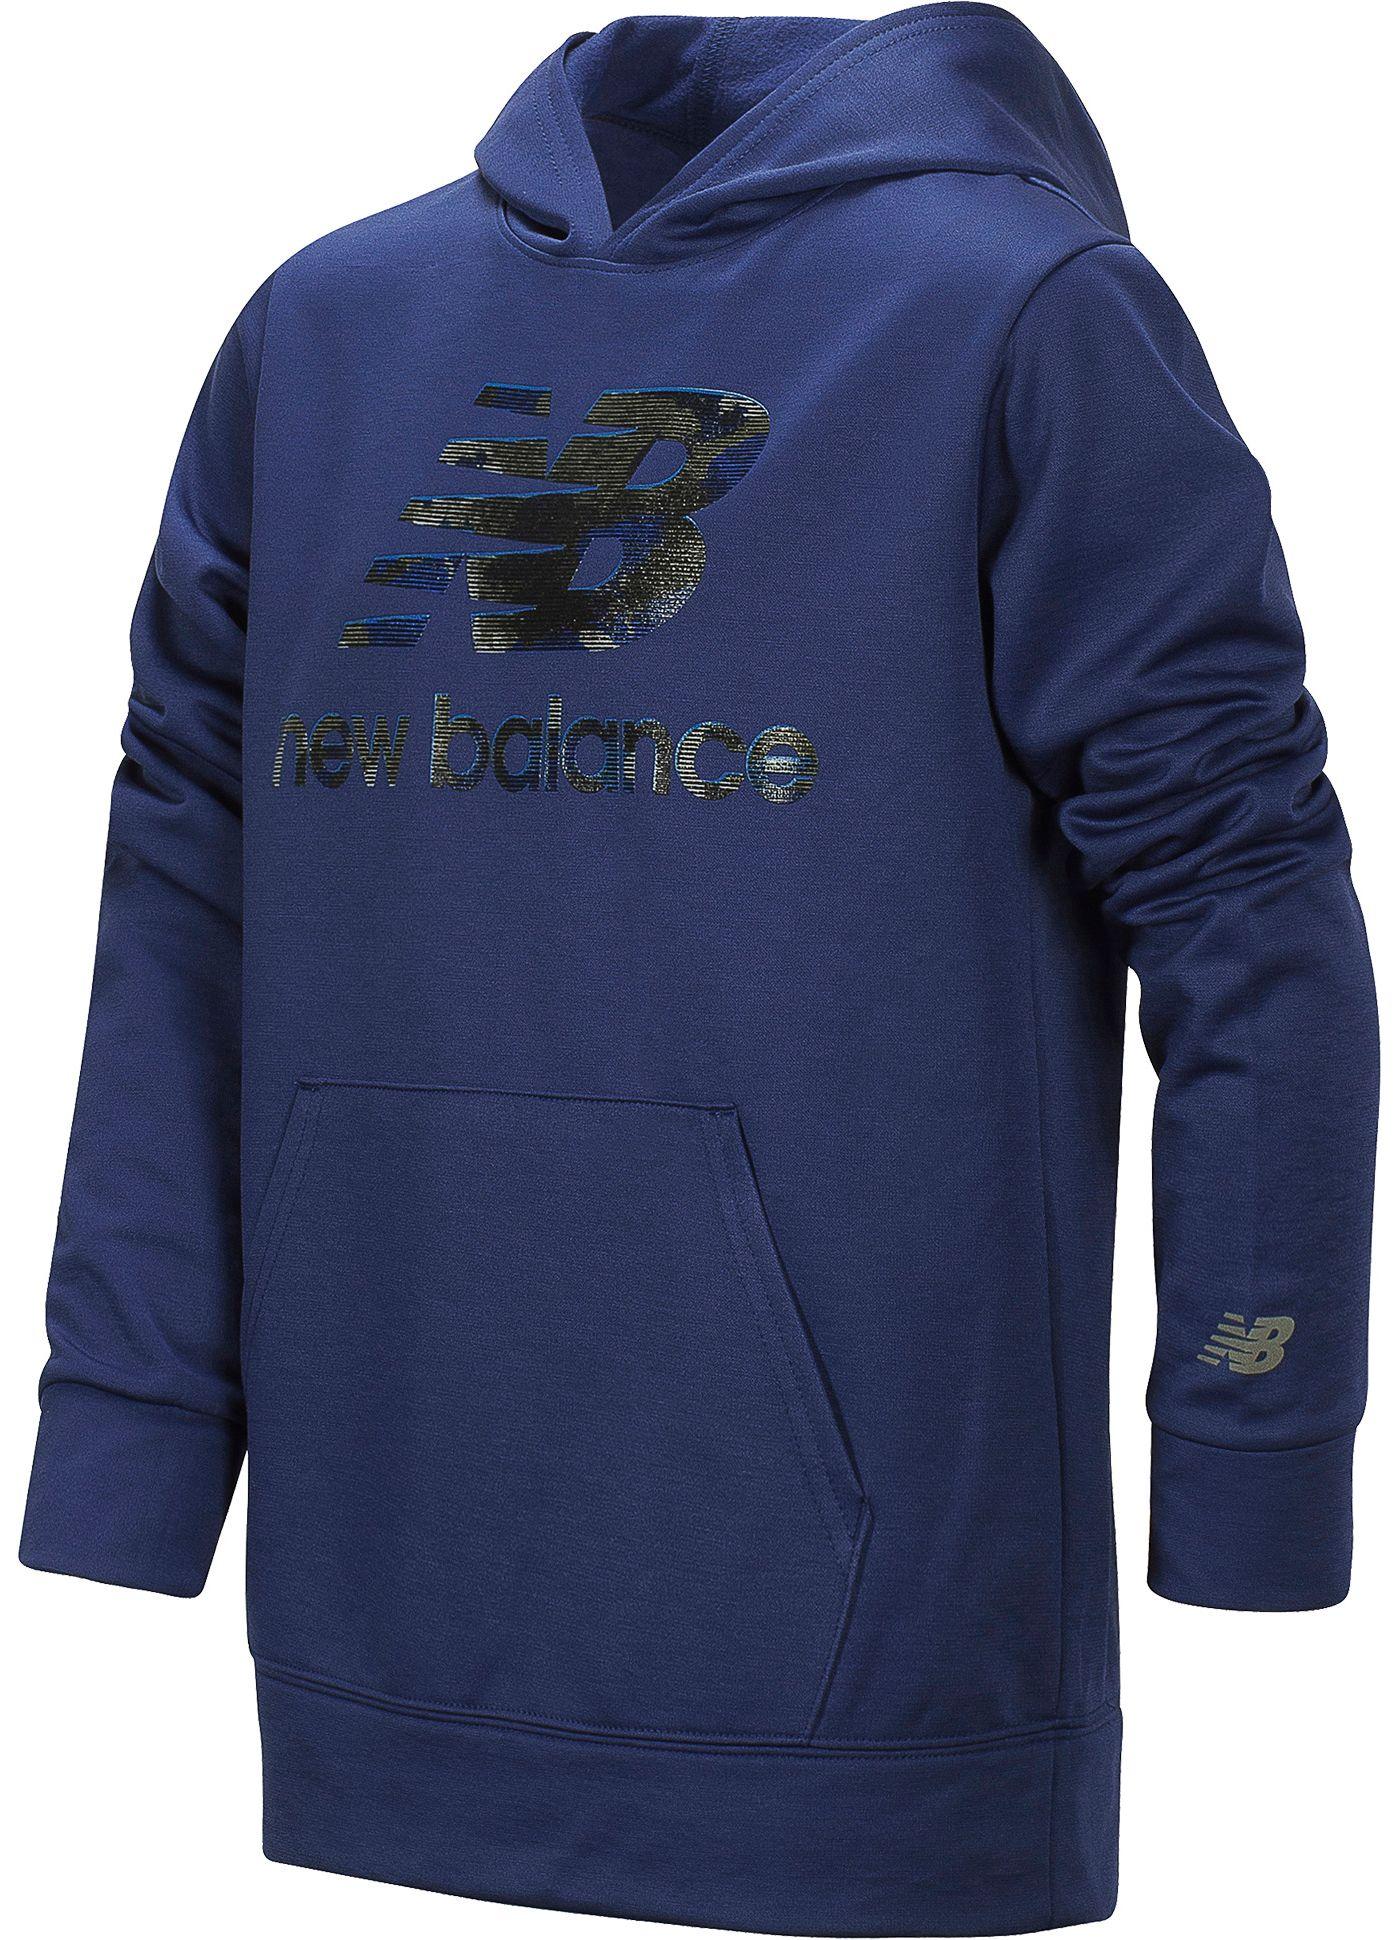 New Balance Little Boys' Logo Graphic Hoodie